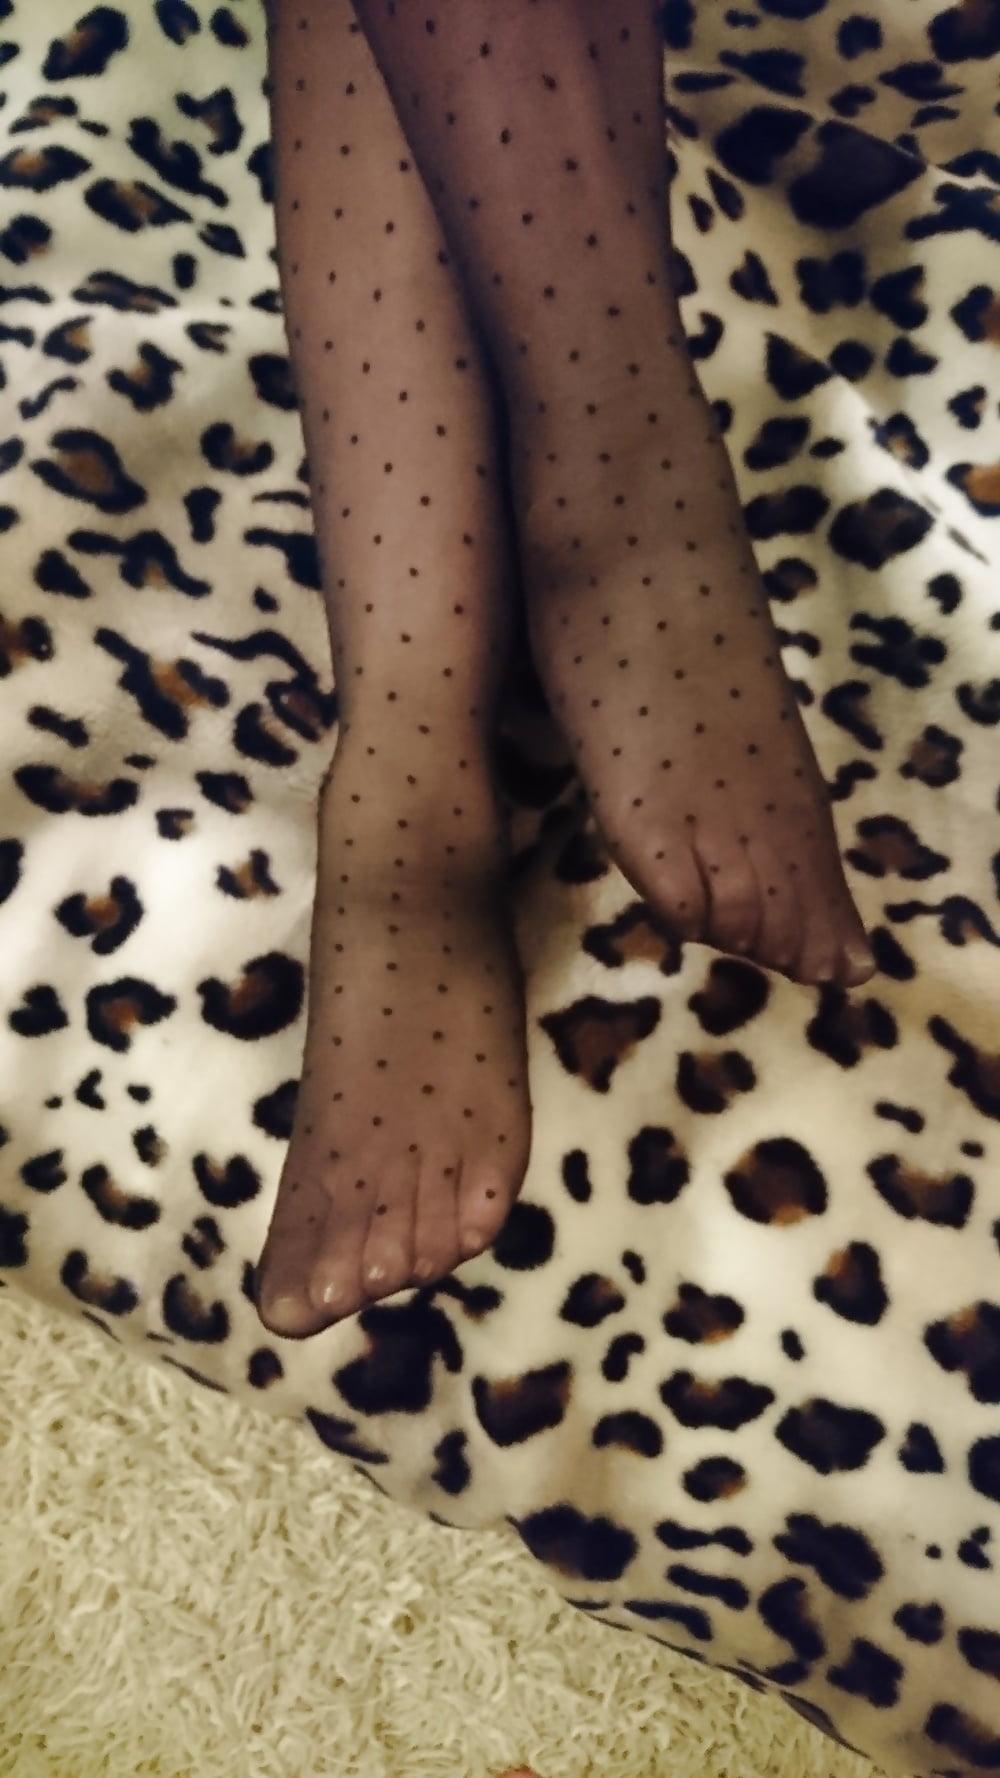 Mature sexy feet tumblr